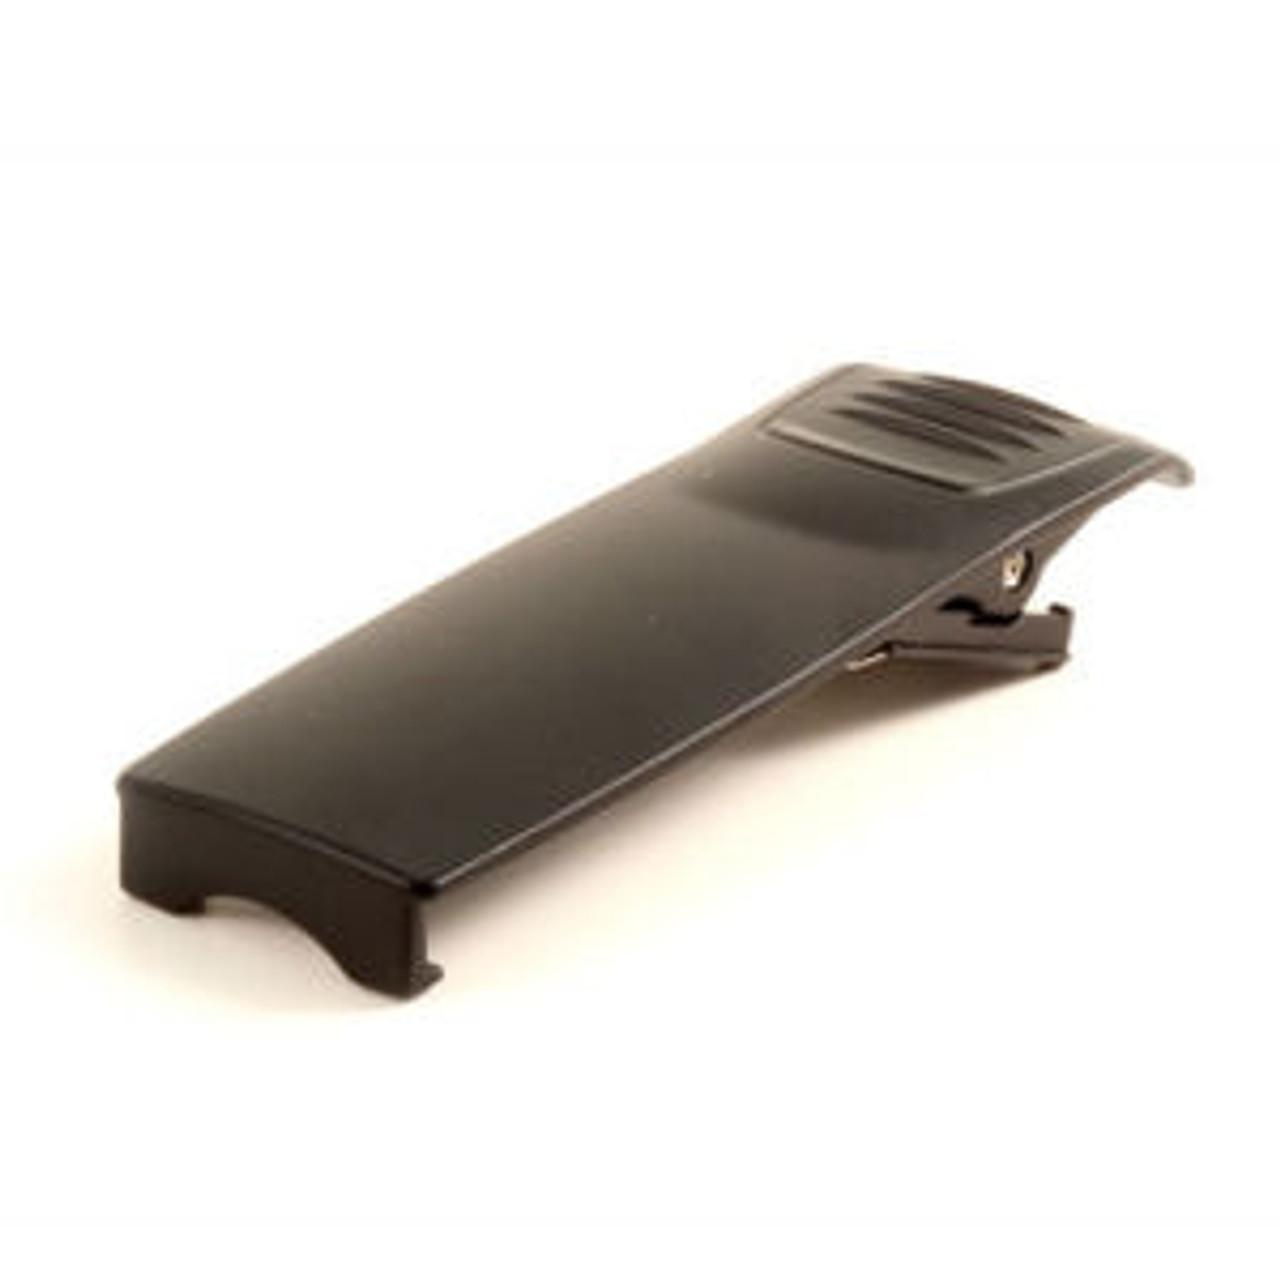 M/A-Com P7250 Metal, Spring Loaded Belt Clip